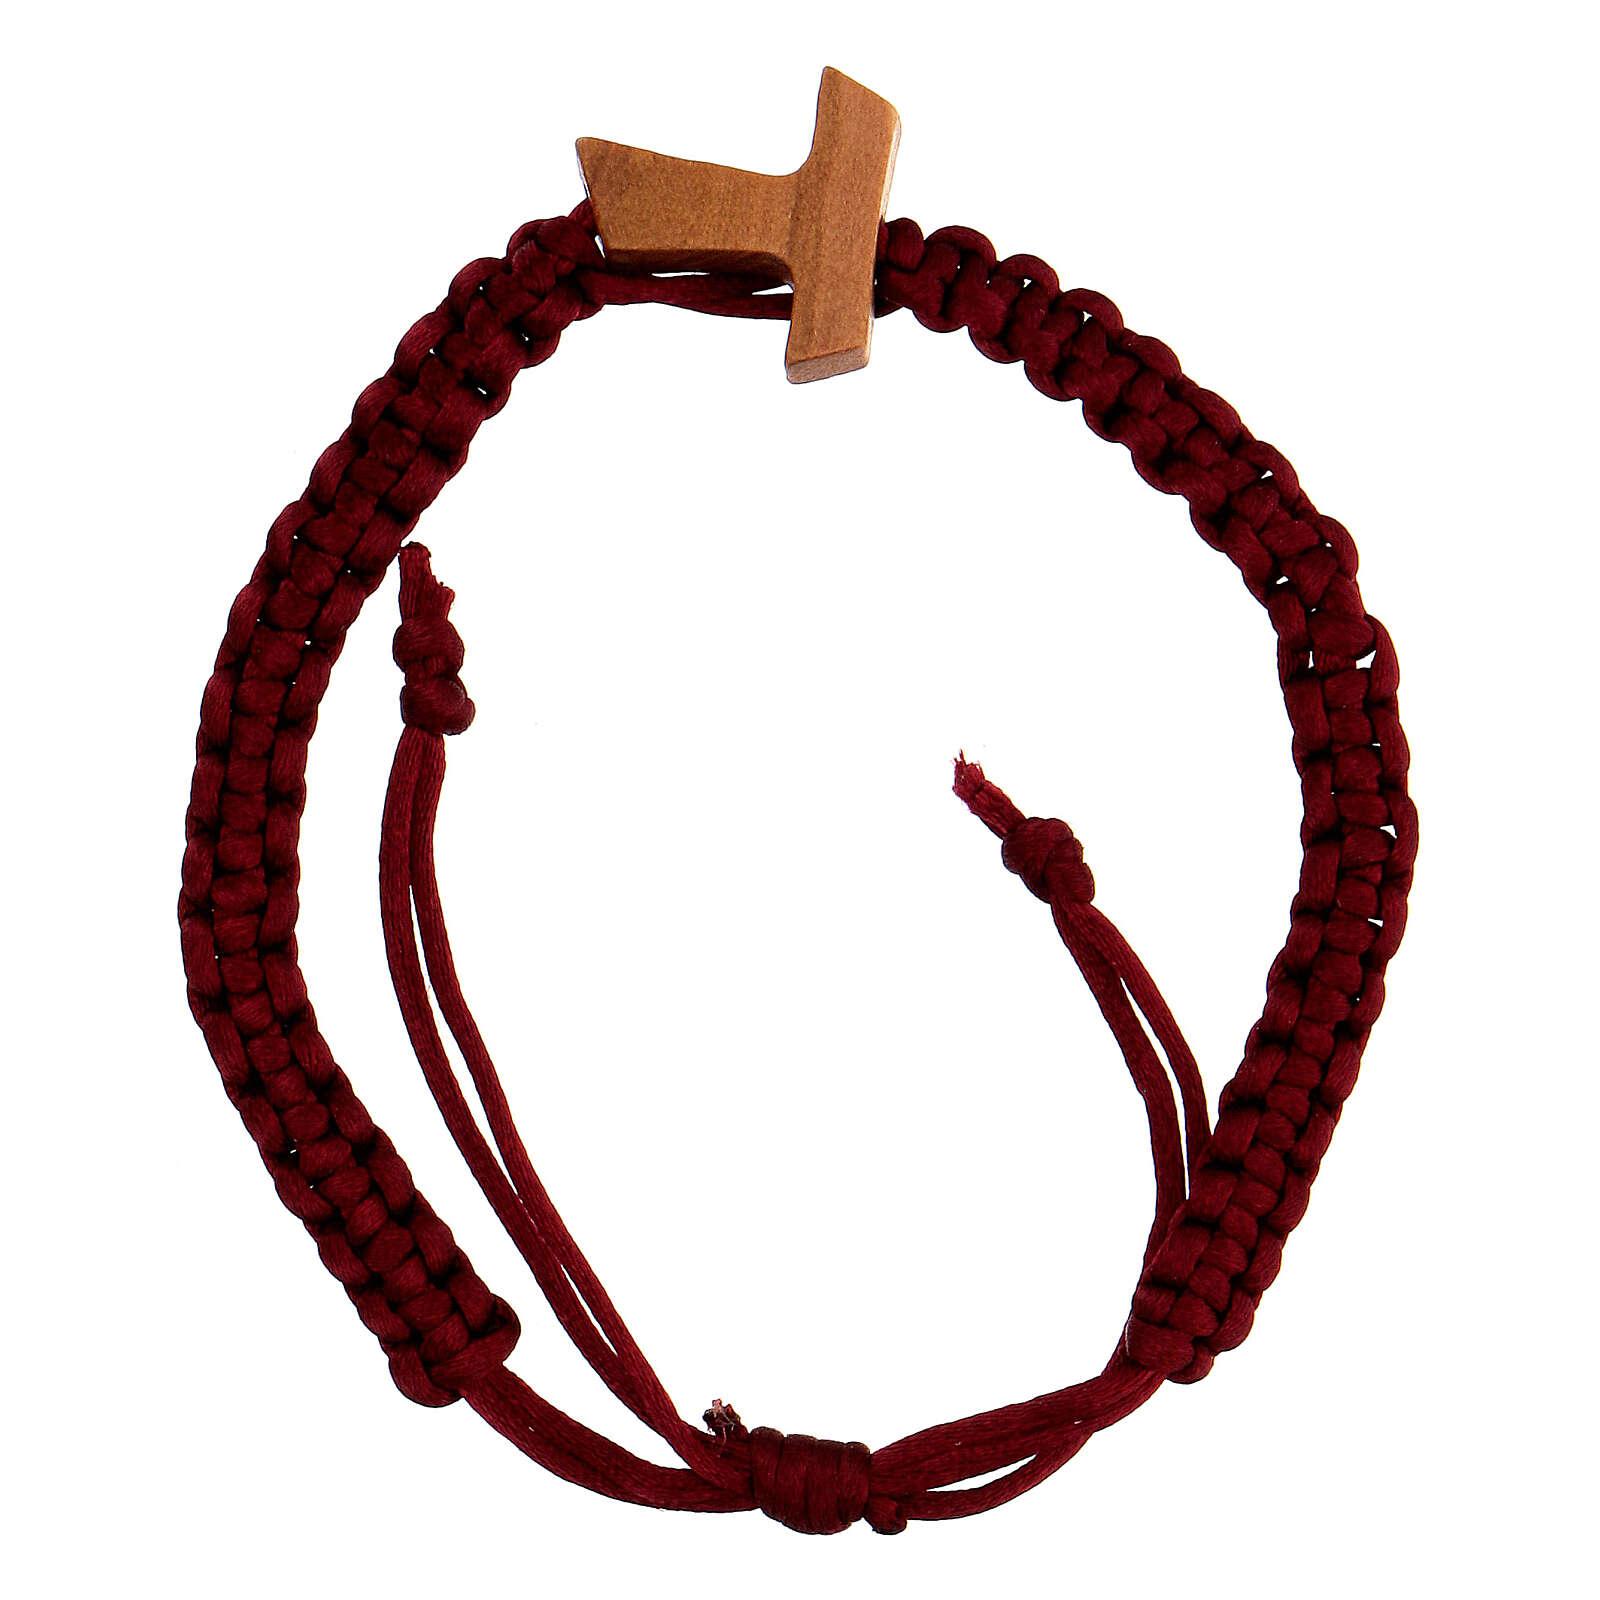 Tau bracelet in red cord, adjustable 4